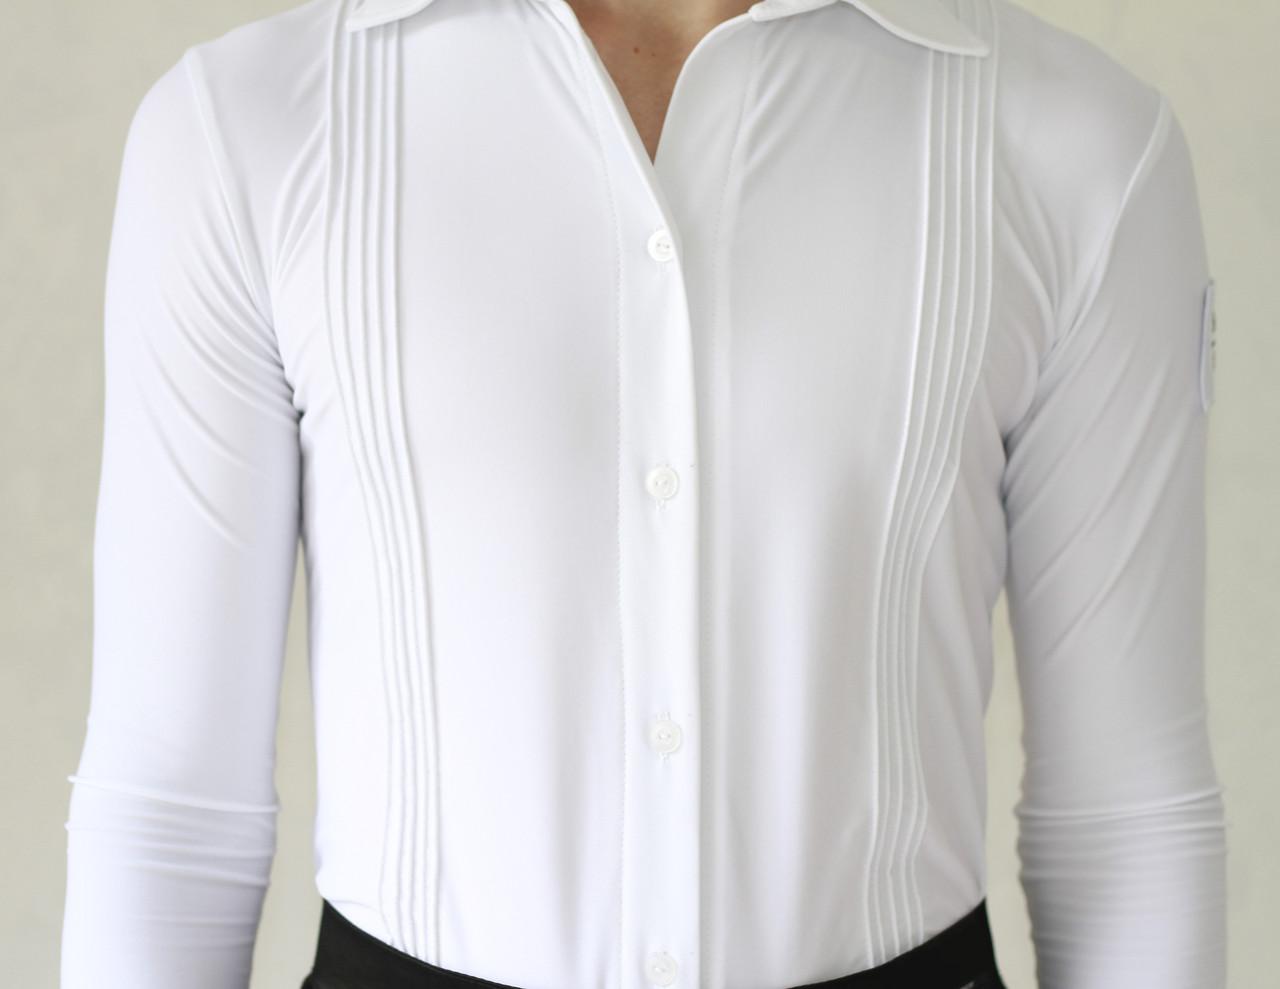 Рубашка мужская для бальных танцев SevenStore белая с защипами